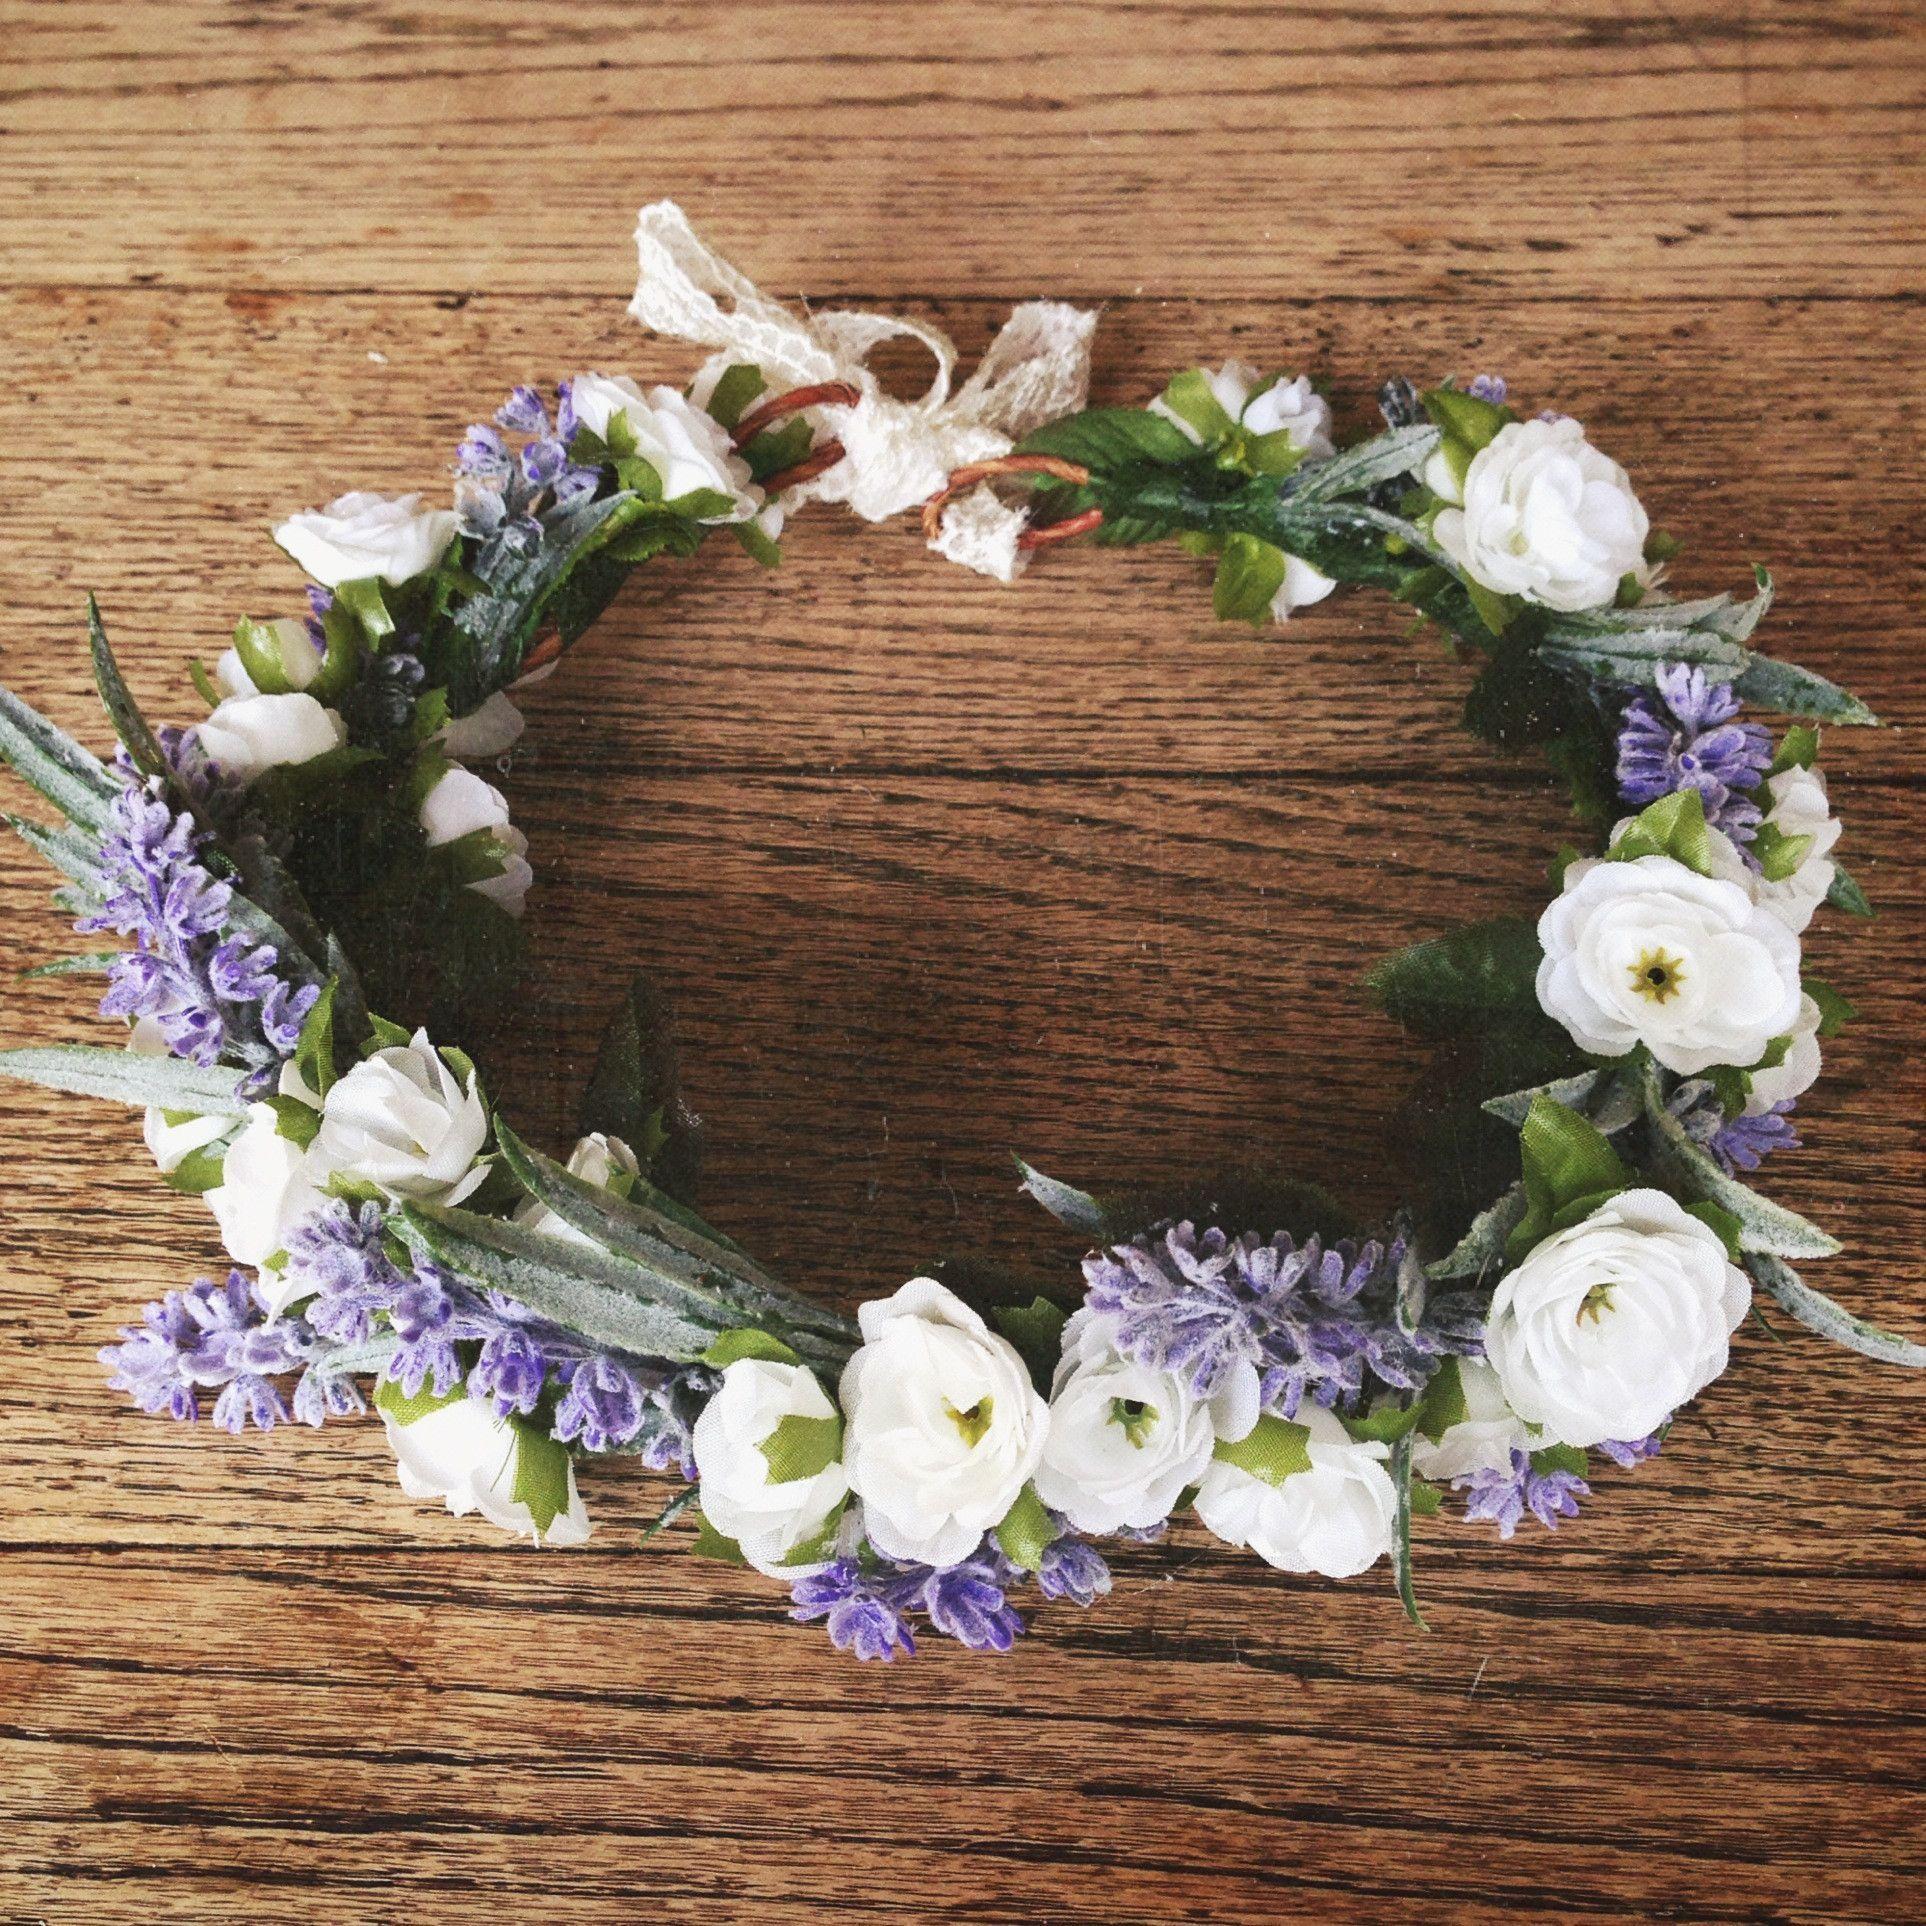 Flower Crown Purple: Pretty Flower Crown White And Purple-The Rebekah Crown